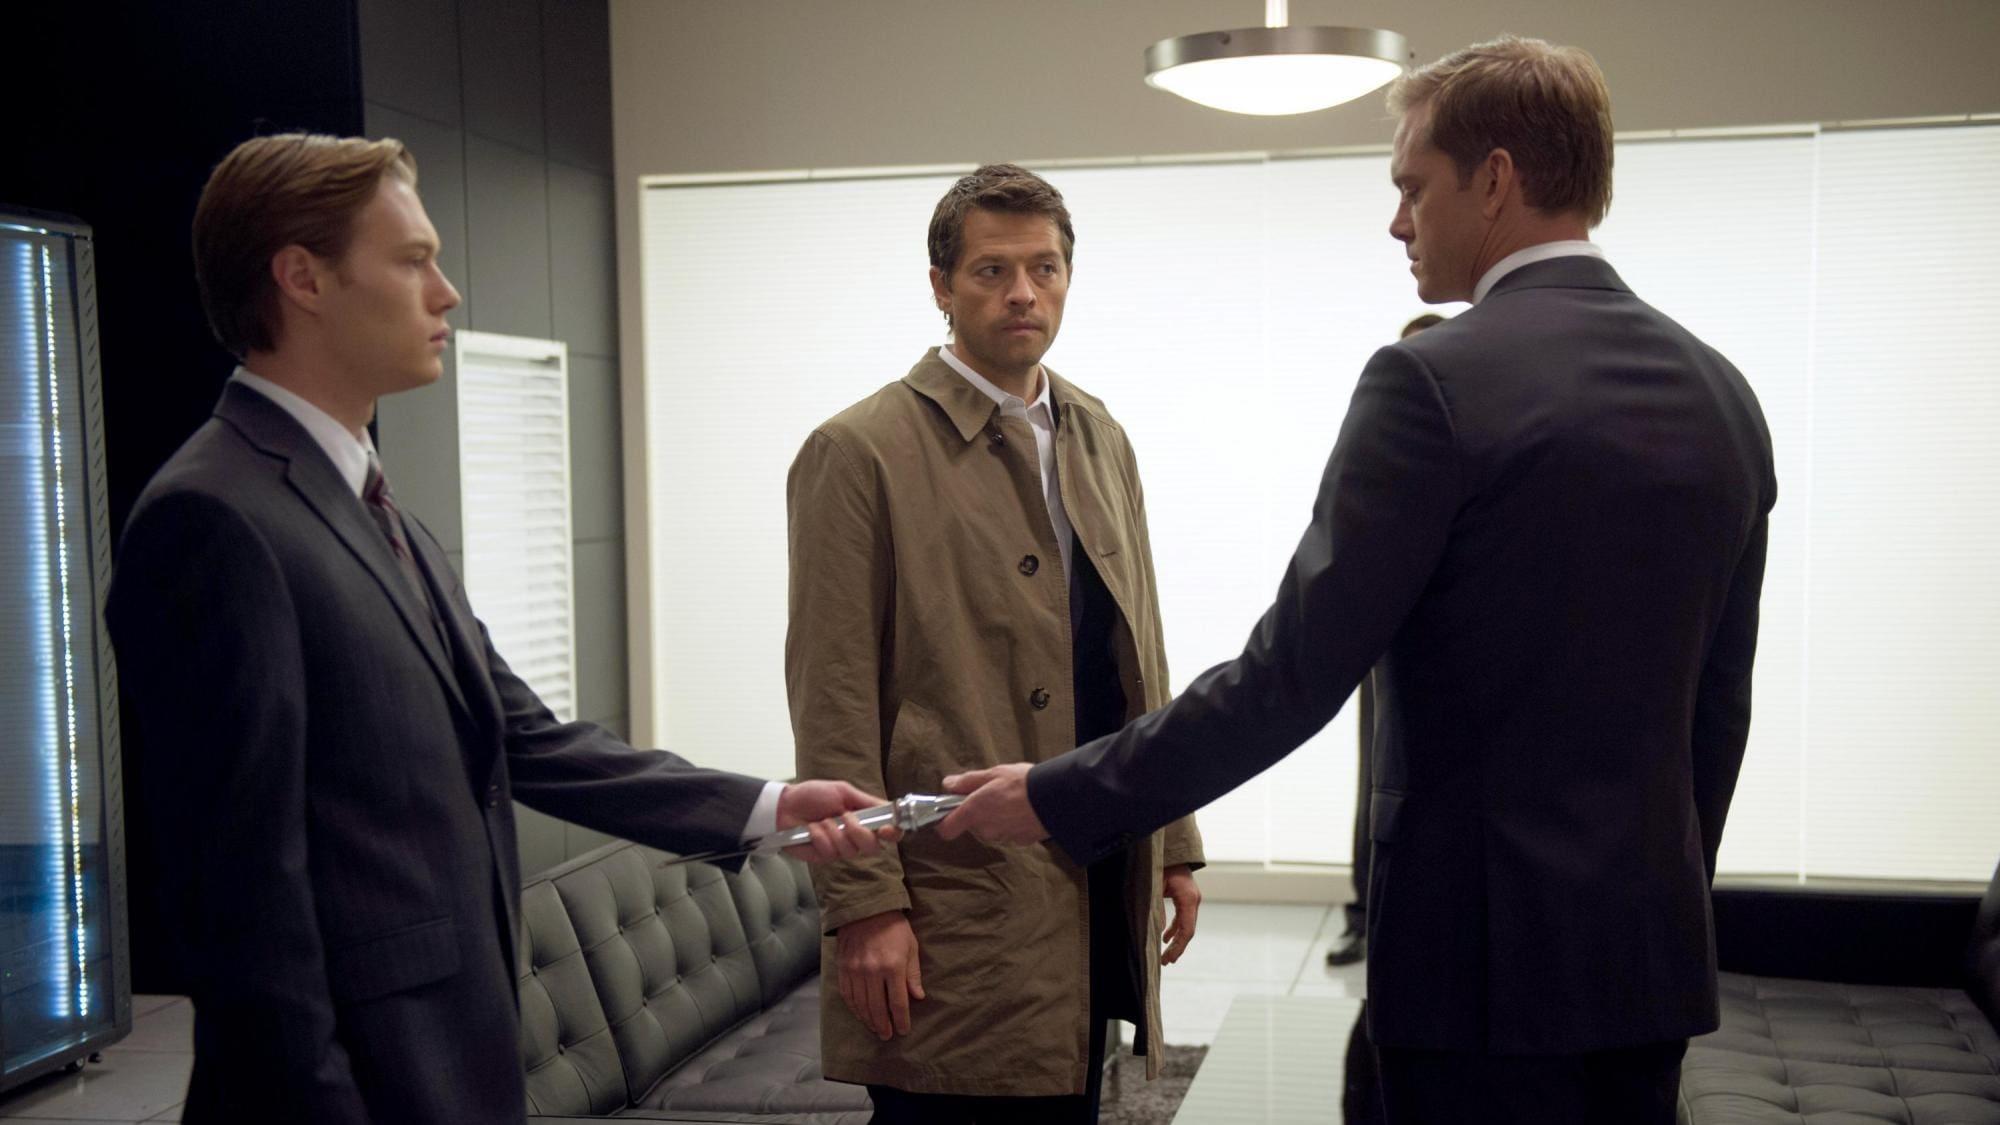 supernatural season 9 episode 14 watch online watch